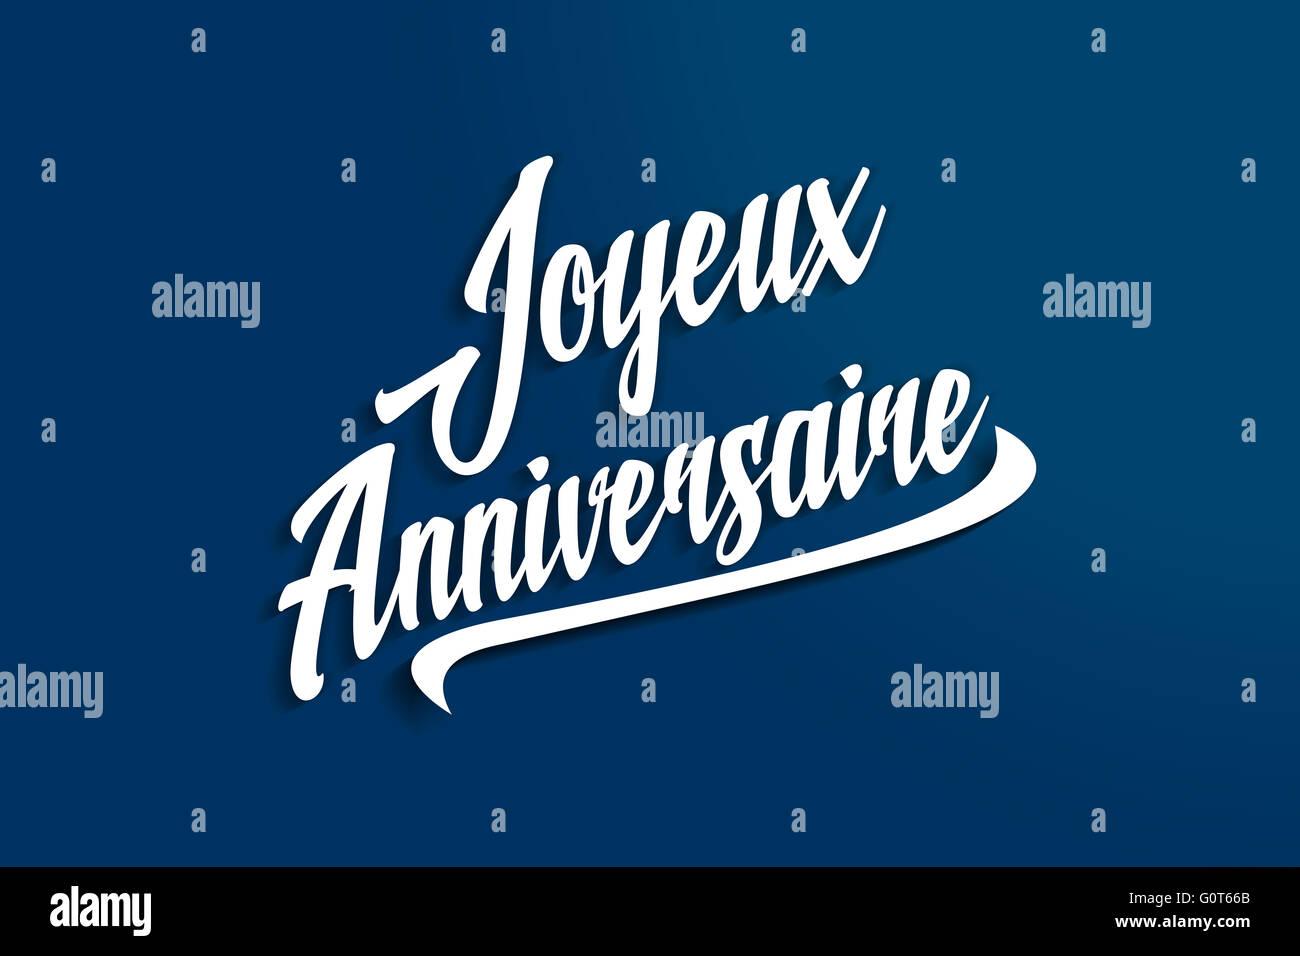 Joyeux anniversaire happy birthday in french anniversary joyeux anniversaire happy birthday in french anniversary greeting postcard illustration kristyandbryce Gallery